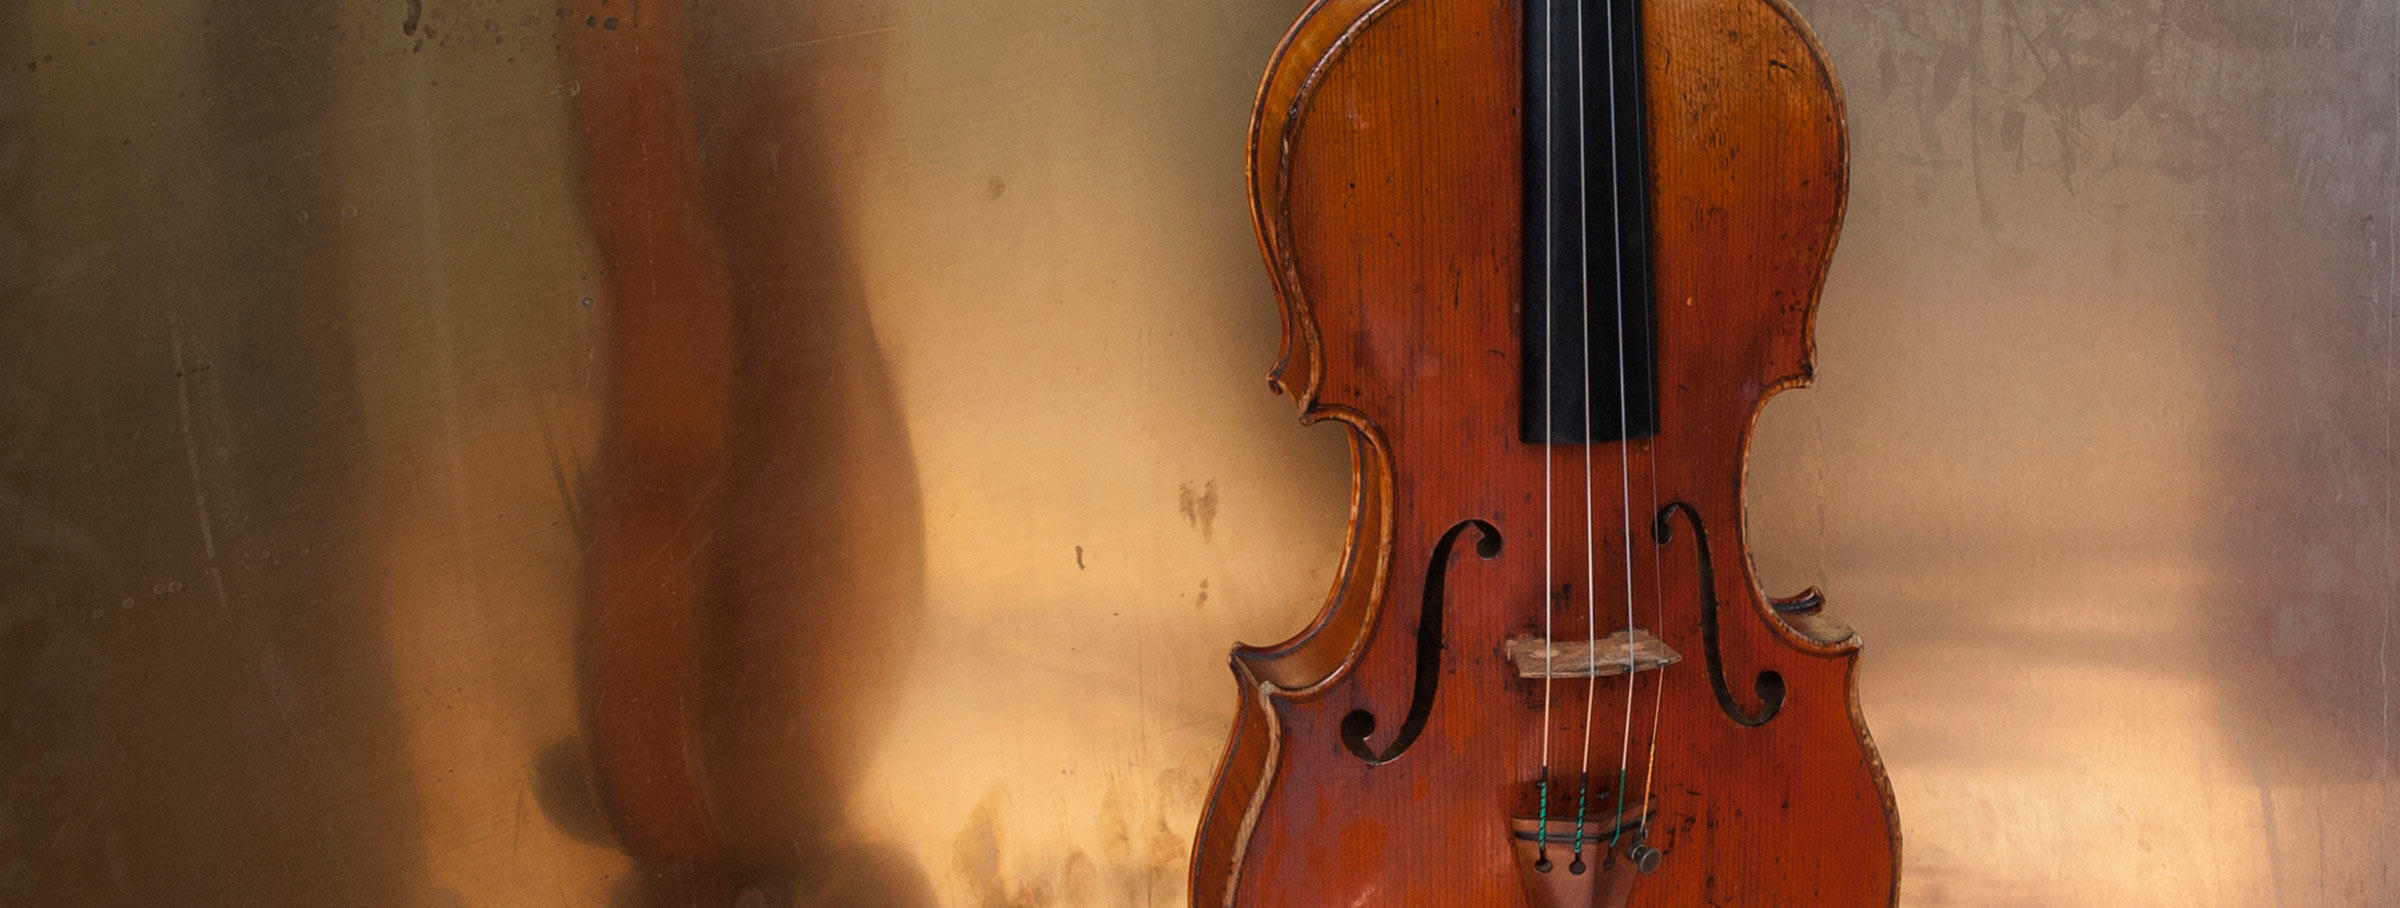 Violin in metal